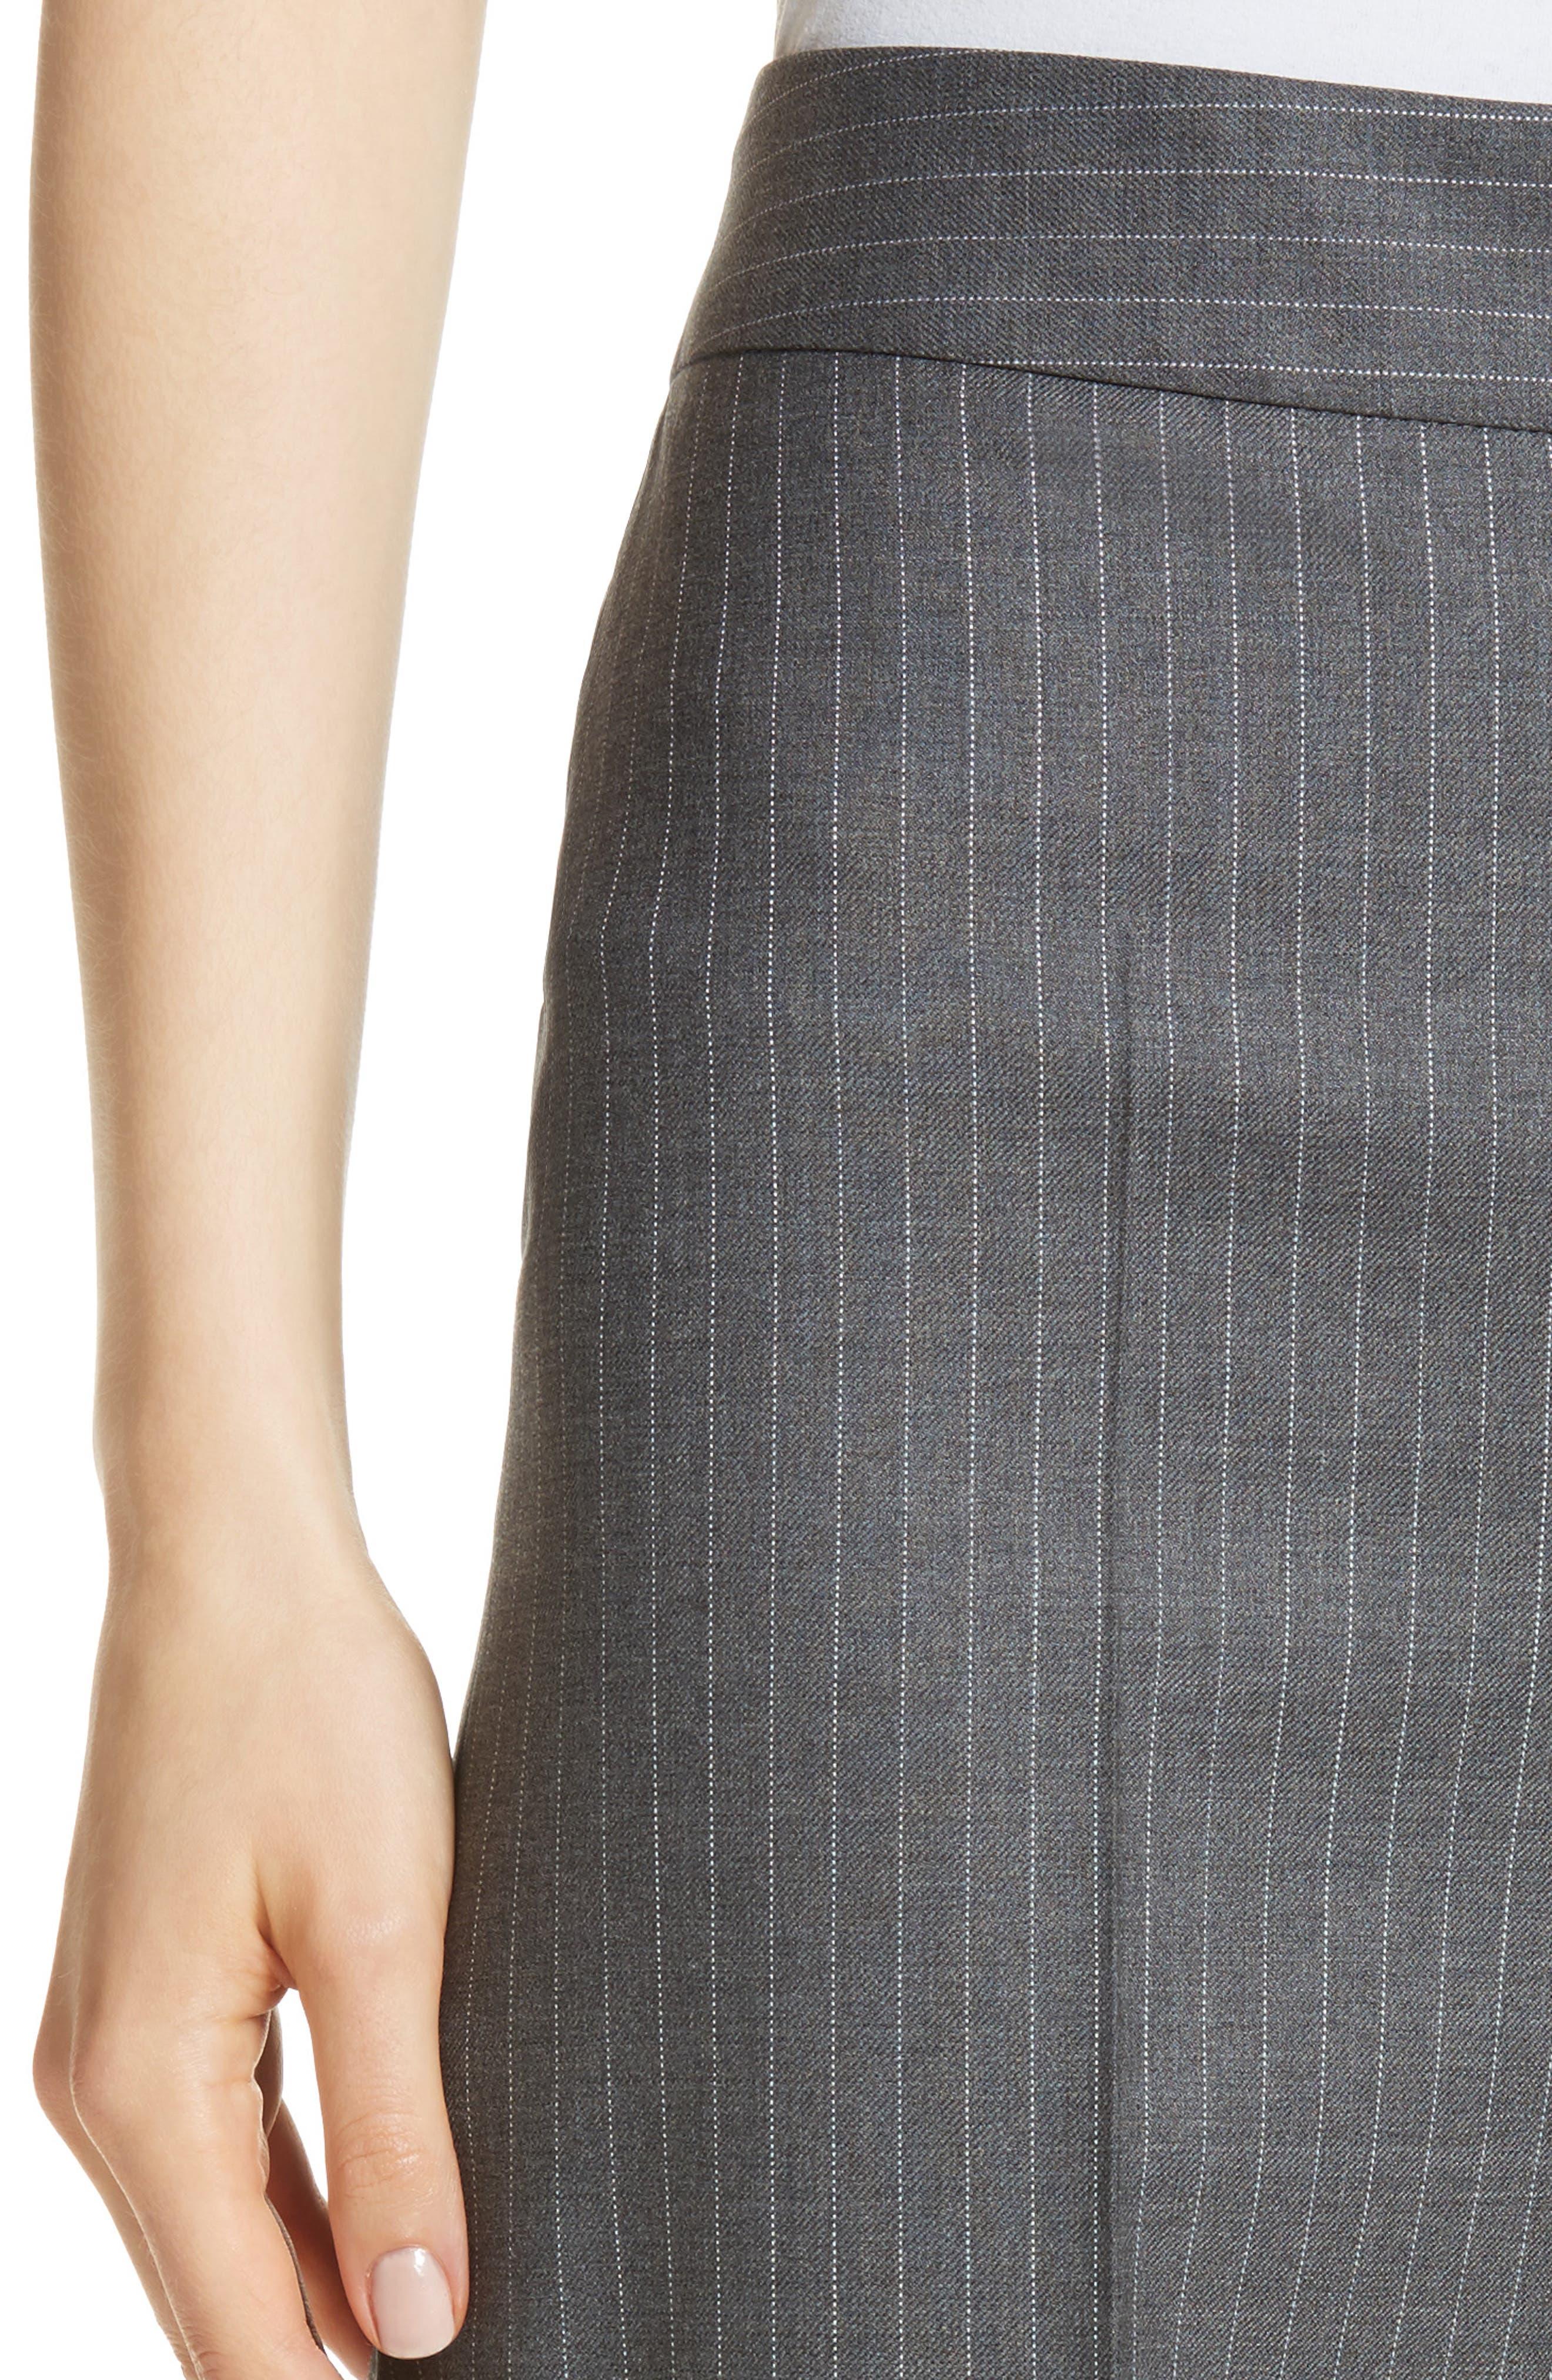 Garibo Stretch Wool Pinstripe Pants,                             Alternate thumbnail 4, color,